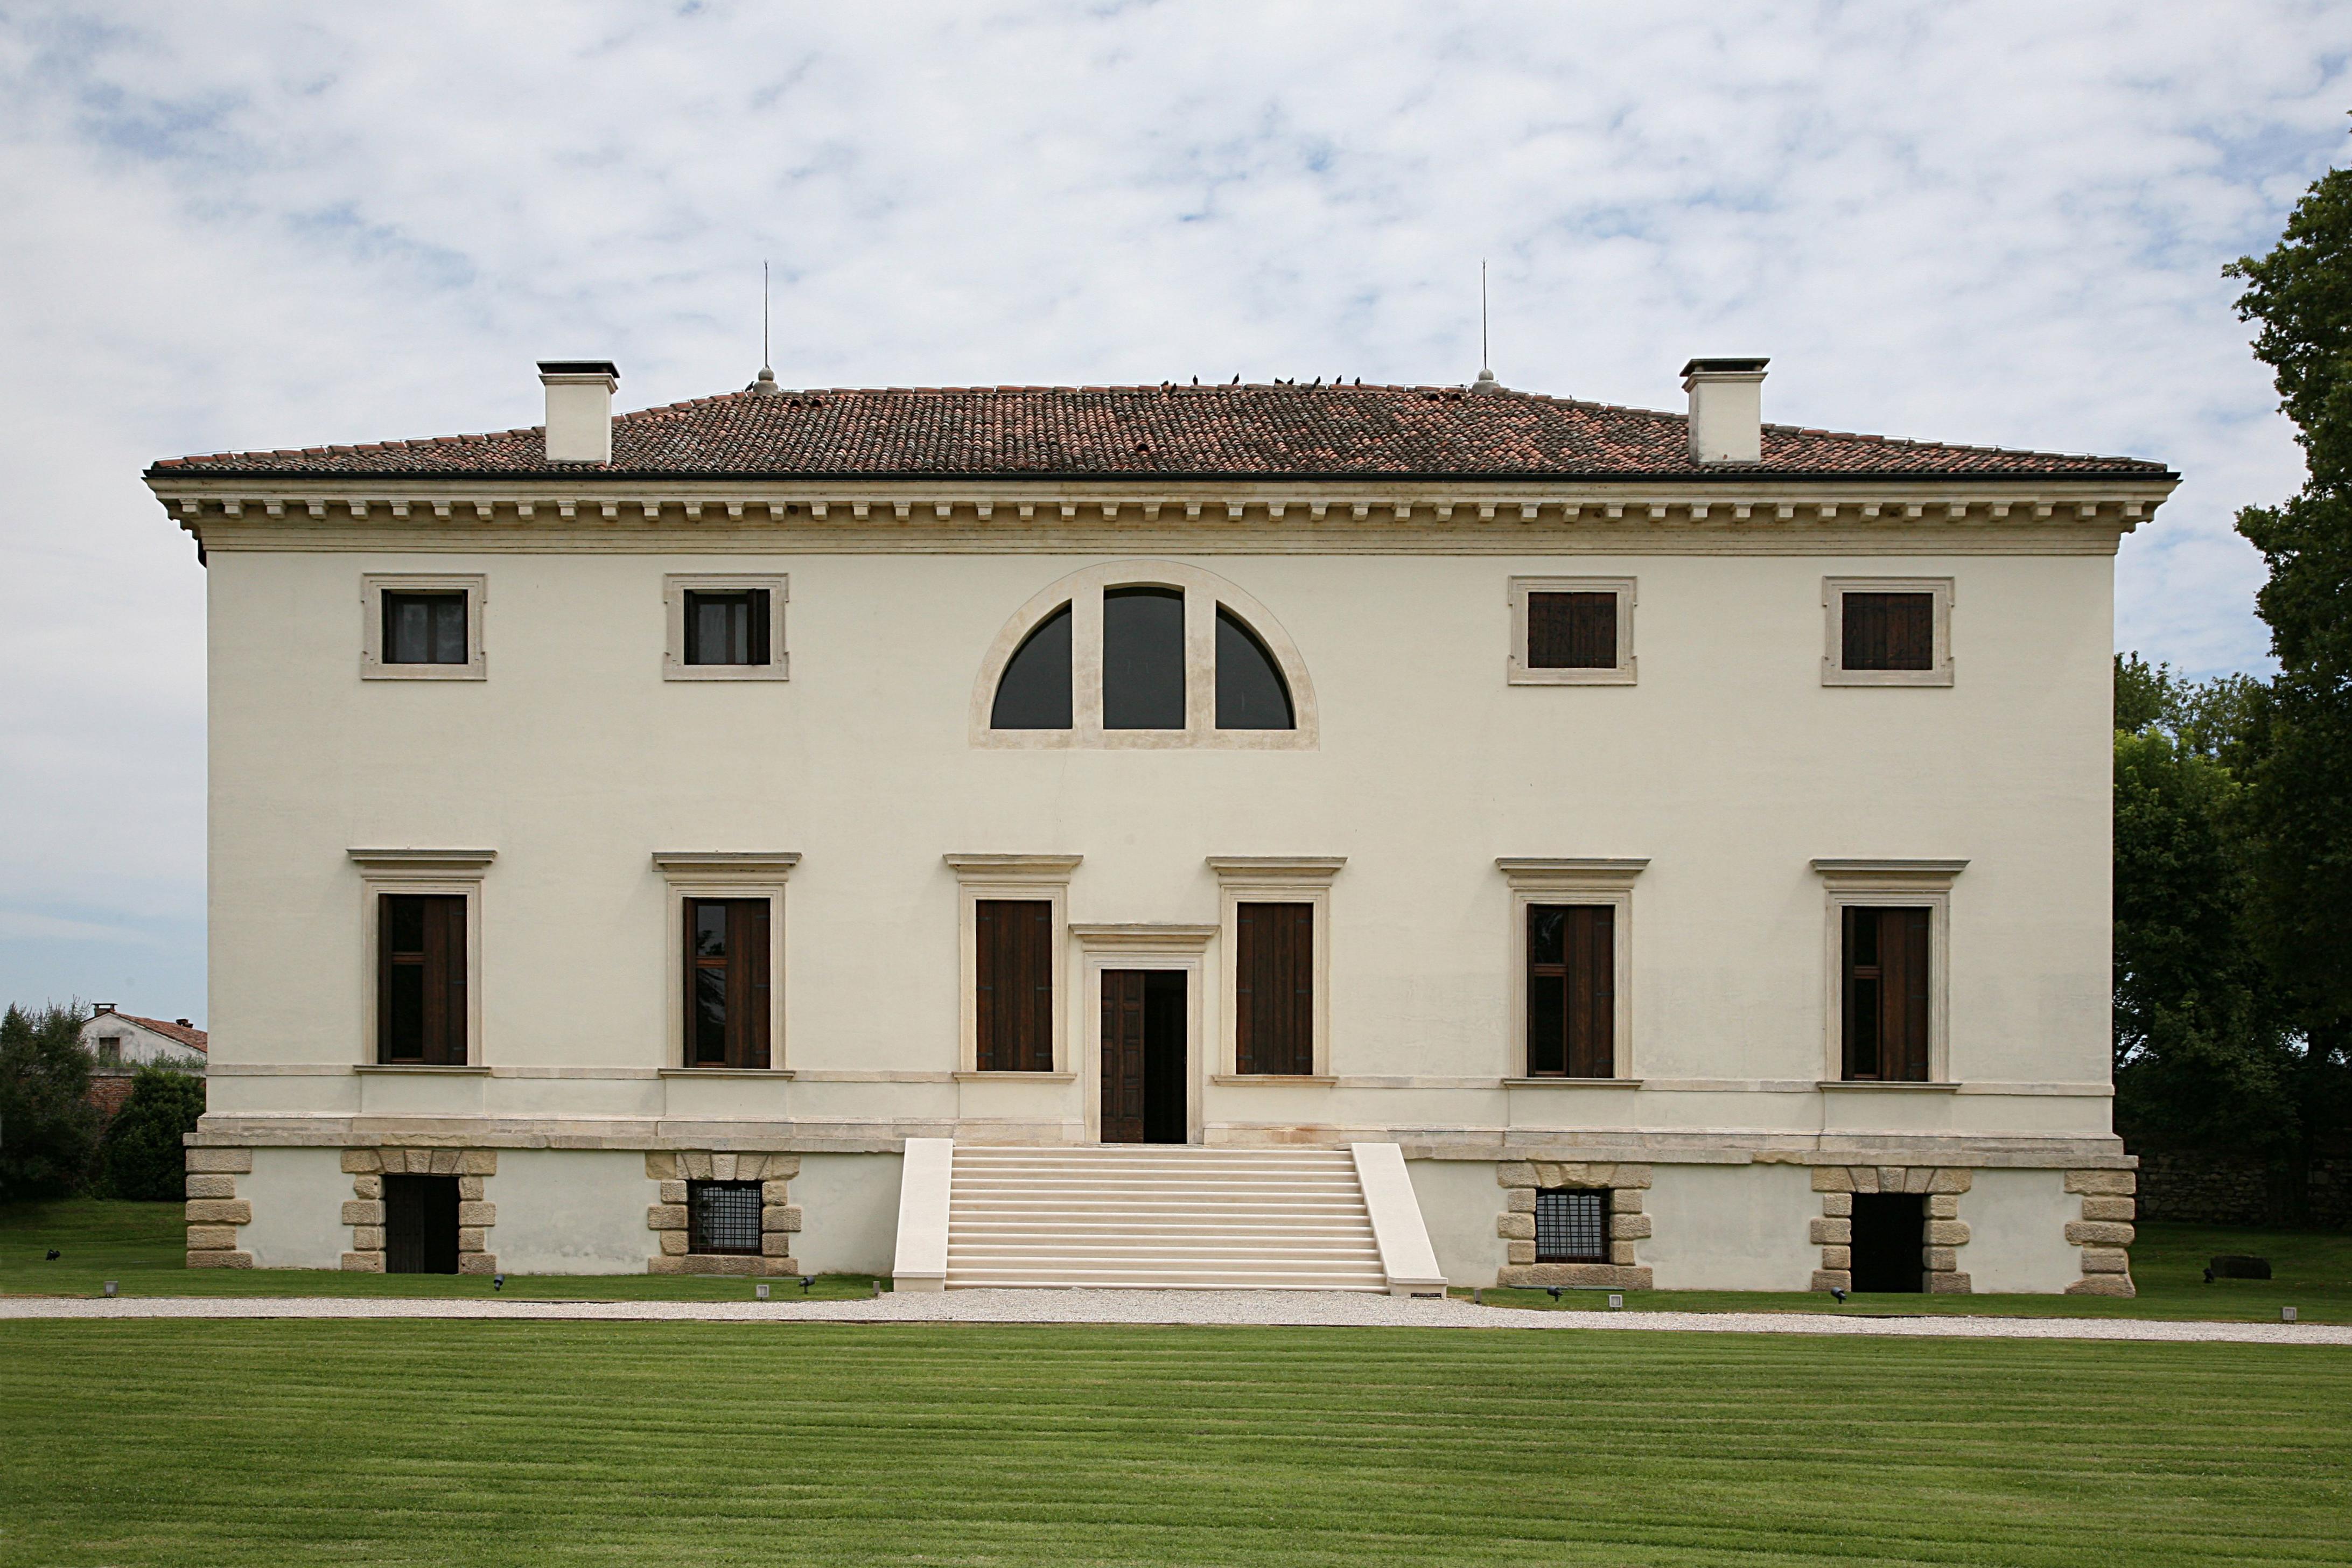 Interni Di Villa Pisani : Datei:villapisani bagnolo 2007 07 06 1.jpg u2013 wikipedia